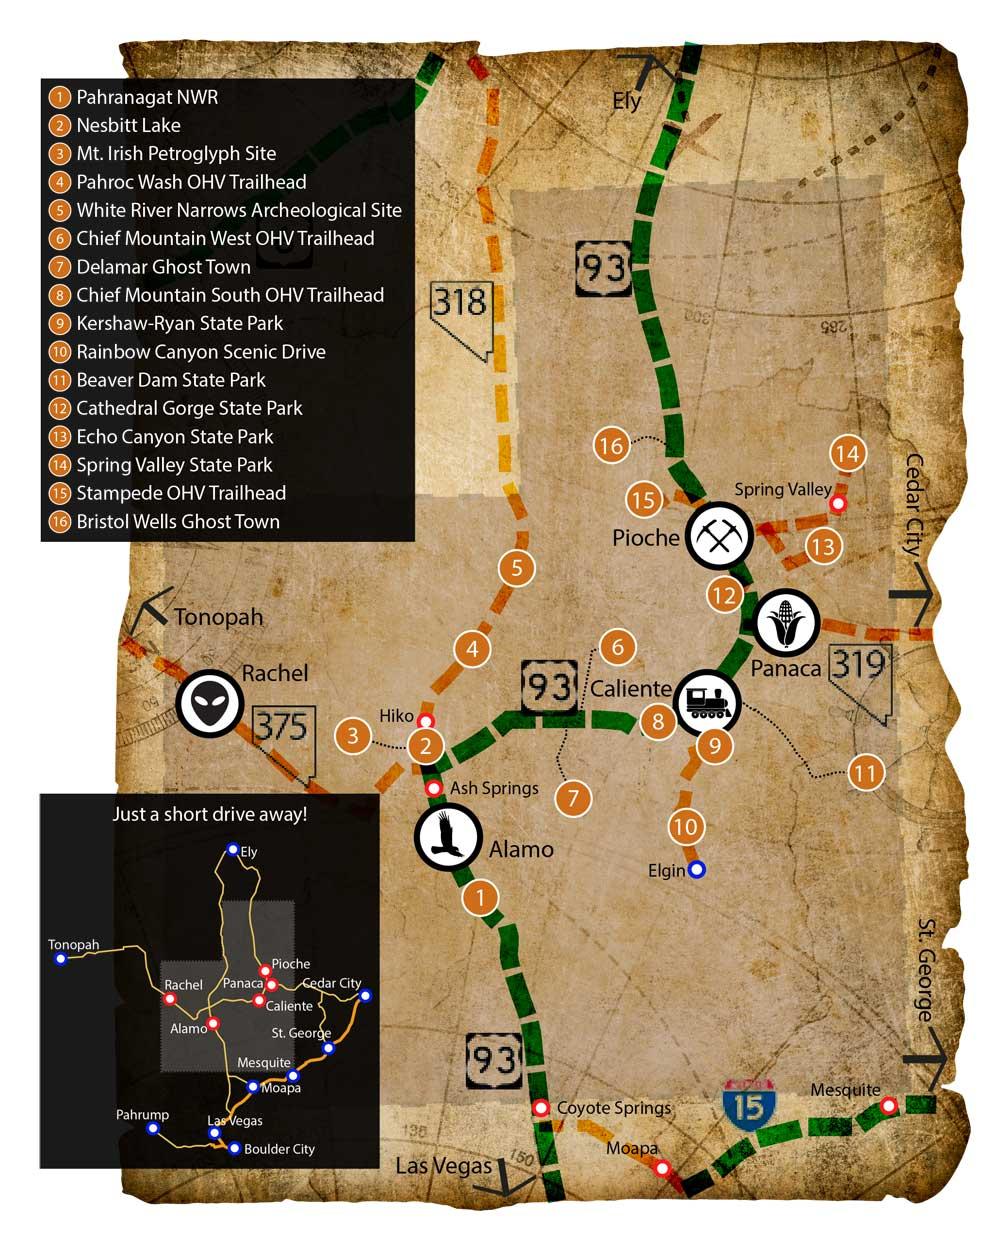 Maps of Lincoln County, Nevada | Destinations Near Las Vegas